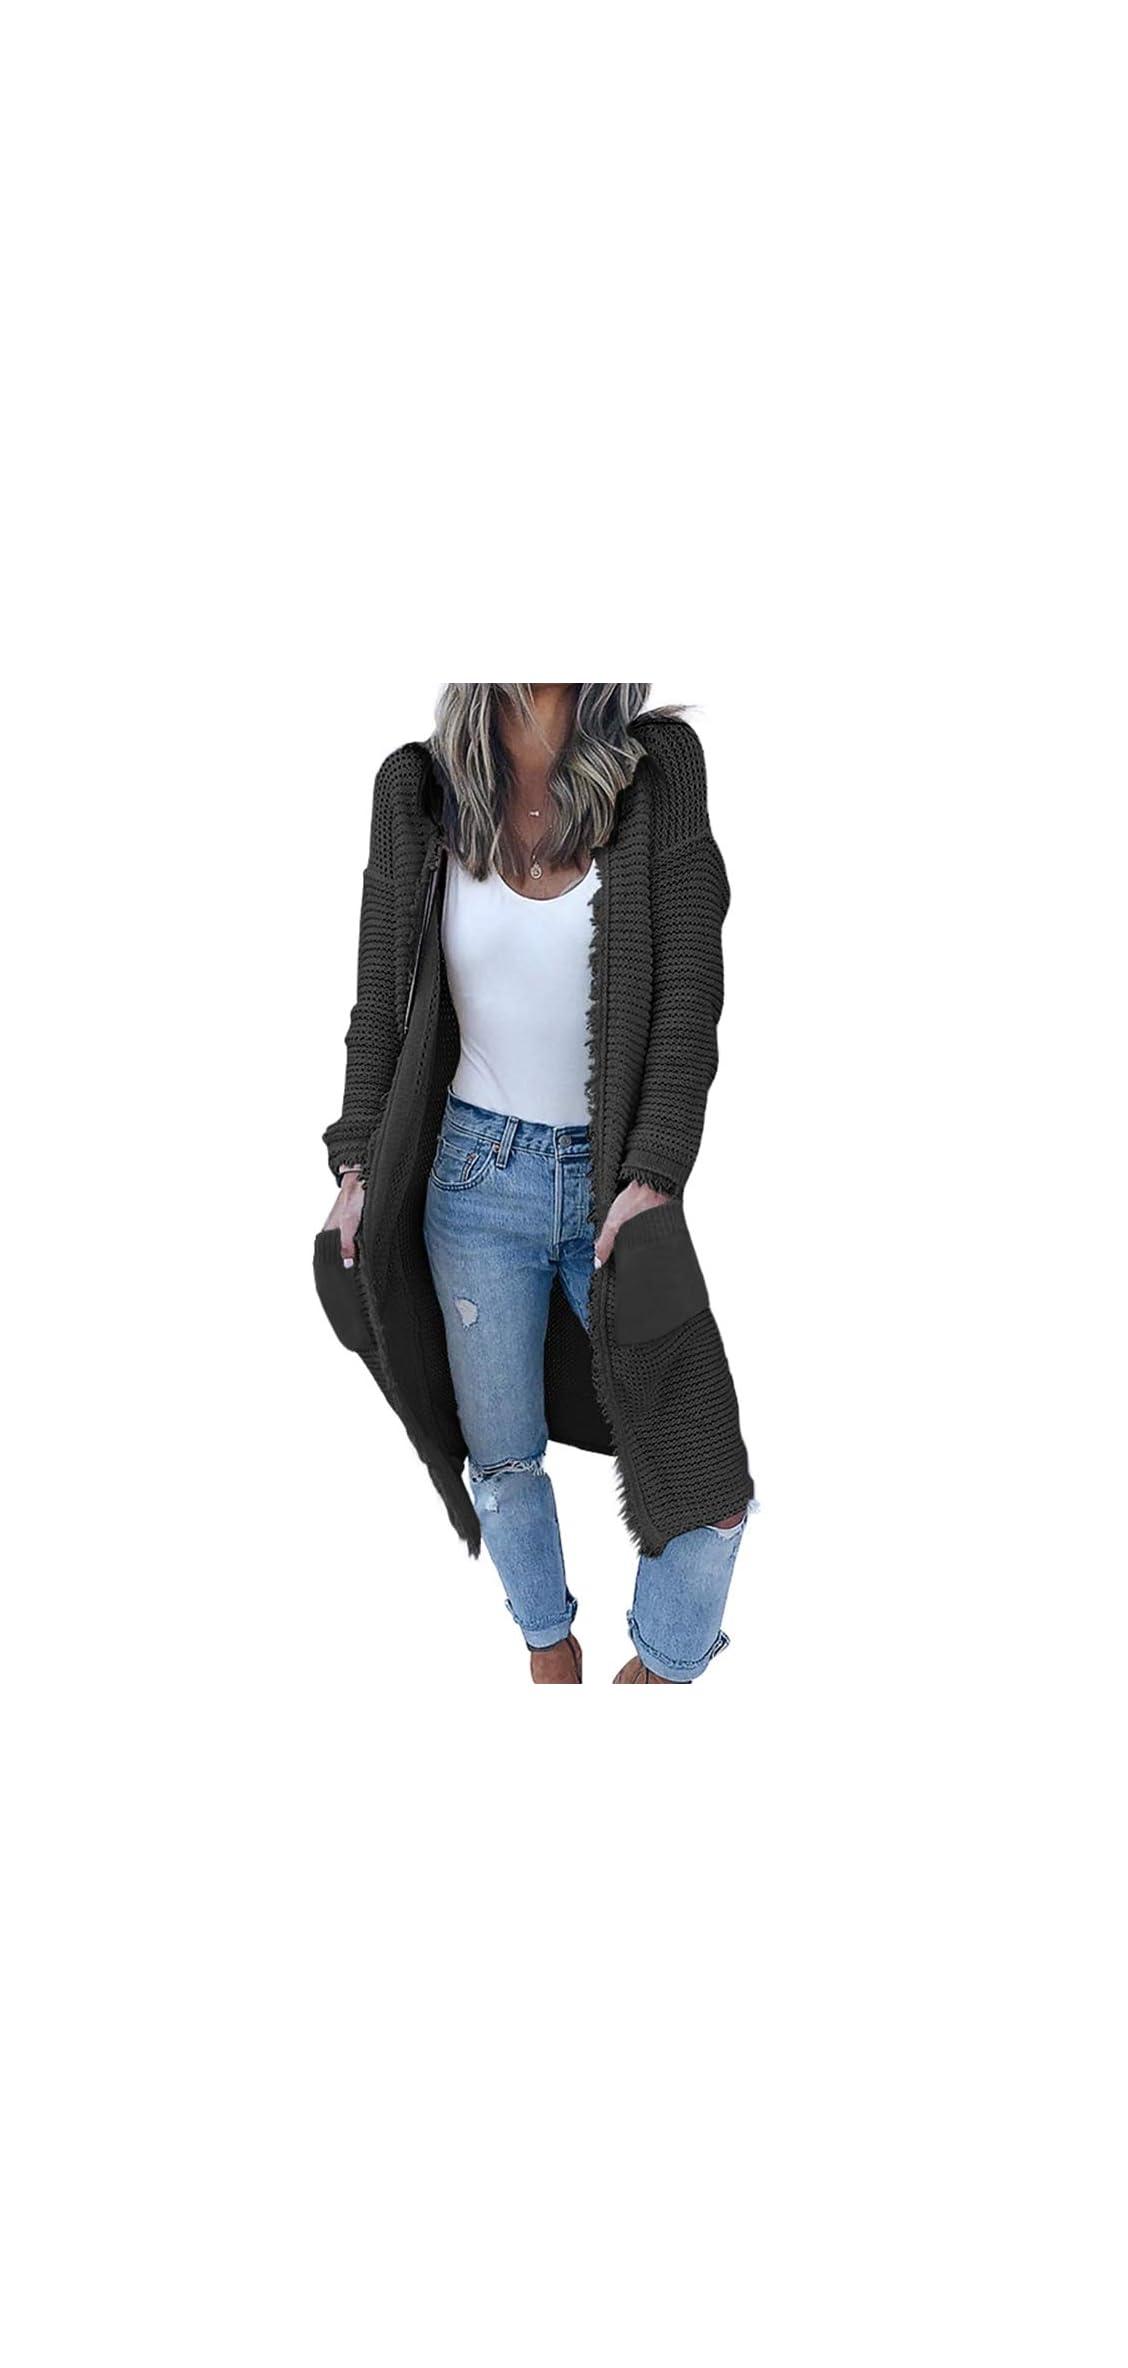 Women's Casual Cardigan Sweaters Cozy Open Front Long